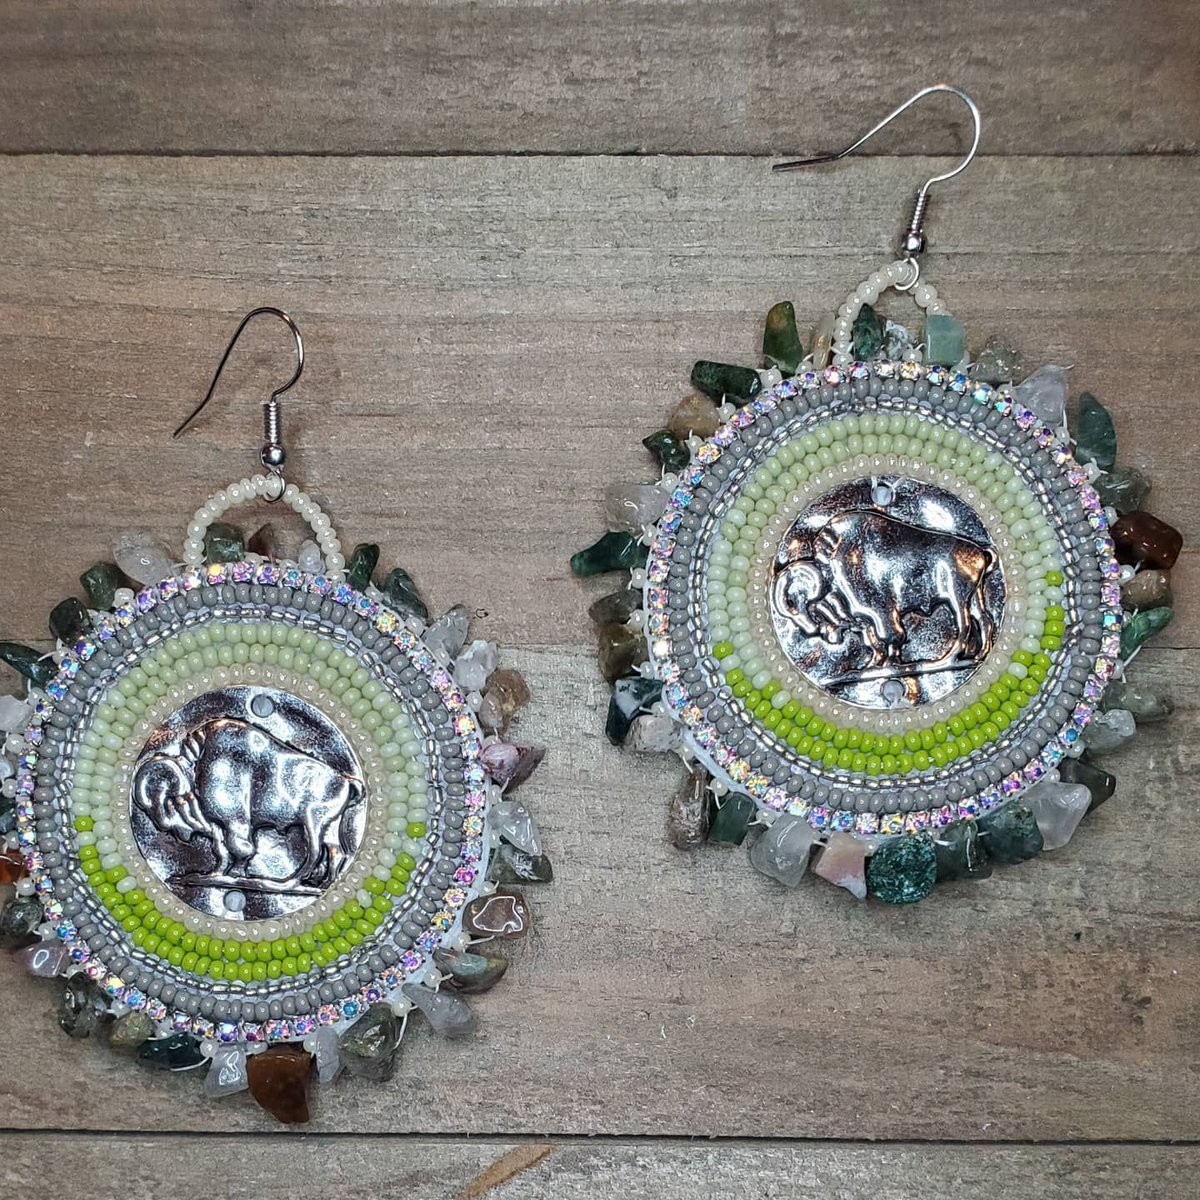 Wandering Buffalo beaded earrings with genuine jasper stones, FREE US shipping in my Etsy shop https://buff.ly/34tiaRC #NativeTwitter #AlaskaNative #FirstNations #Statimc #Unangax #Aleut #beadedearrings #beadwork #buynative #NativeMadepic.twitter.com/7xLtjo5ljQ